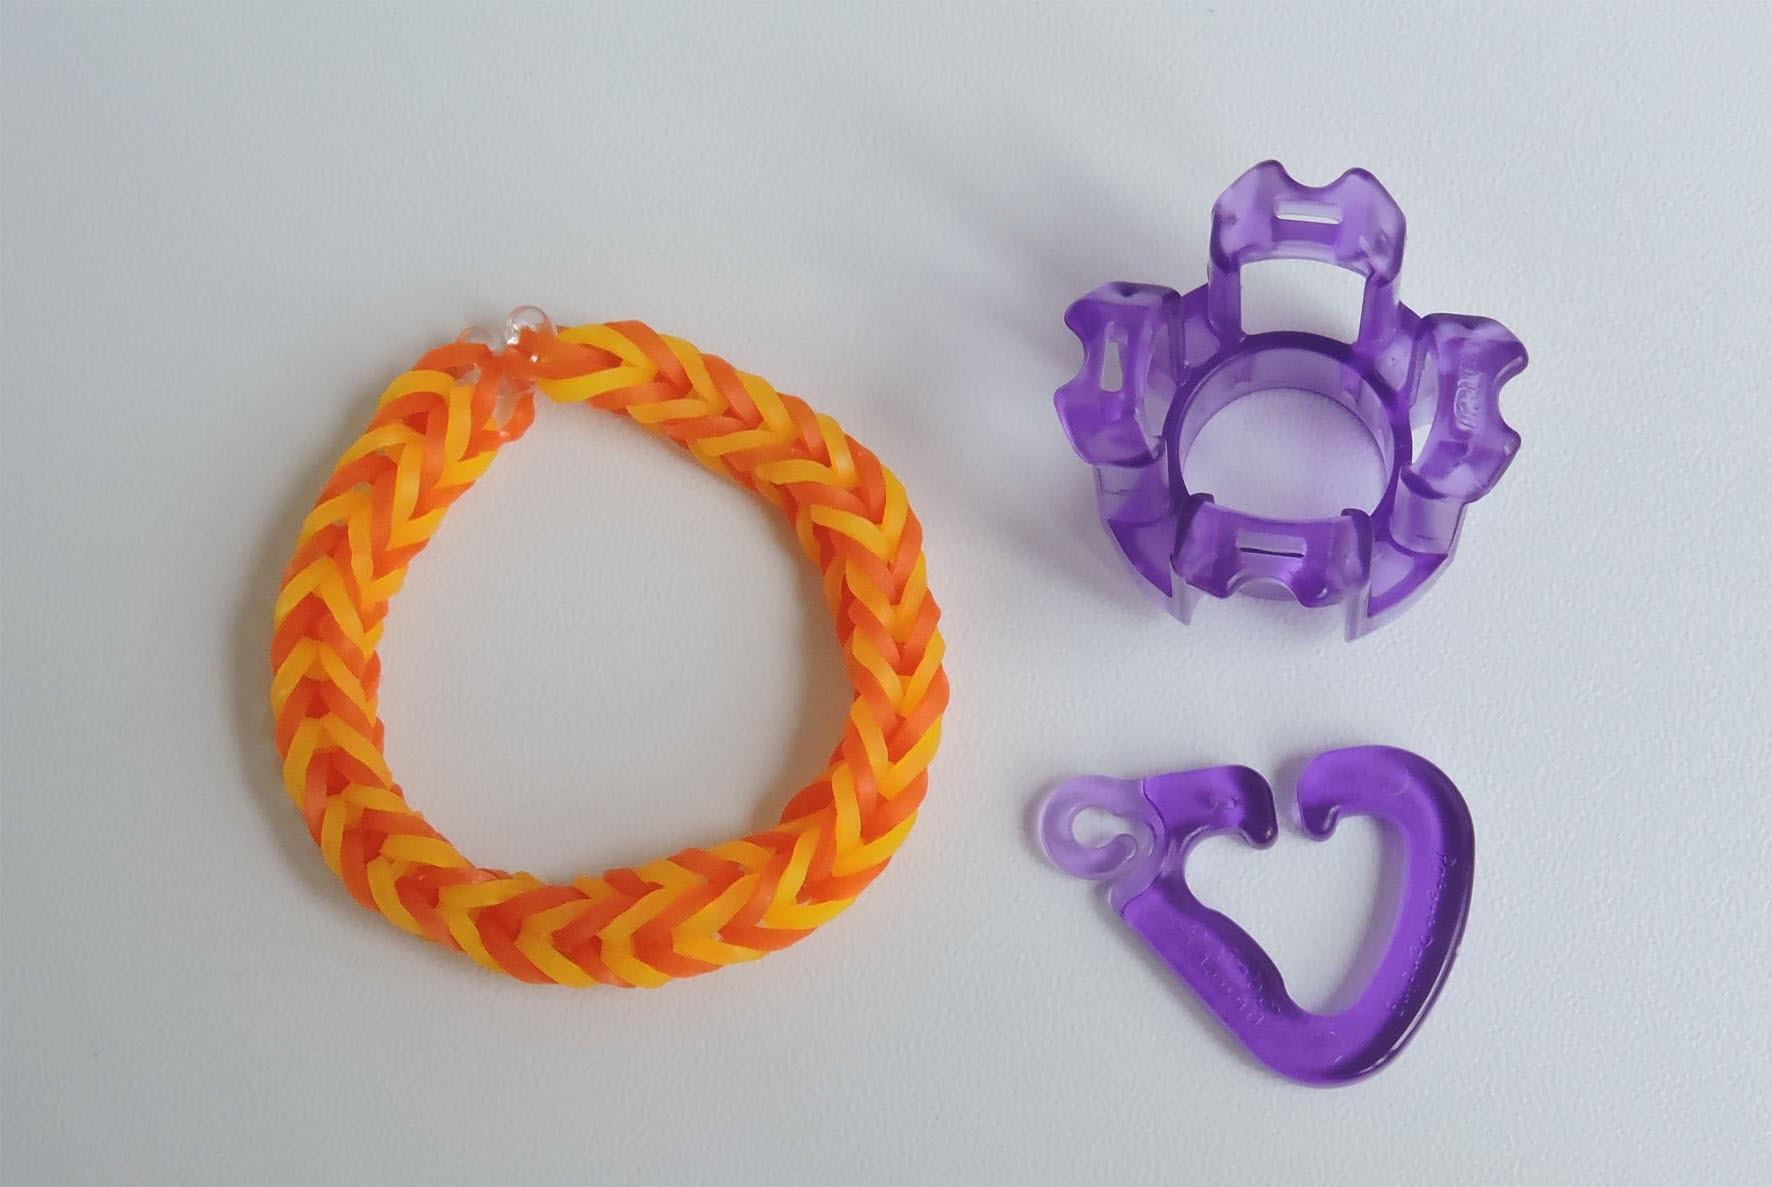 Fingerloom einfaches Armband,Crazy Loom,Rainbow Loom,Zauber Loom,Deutsch